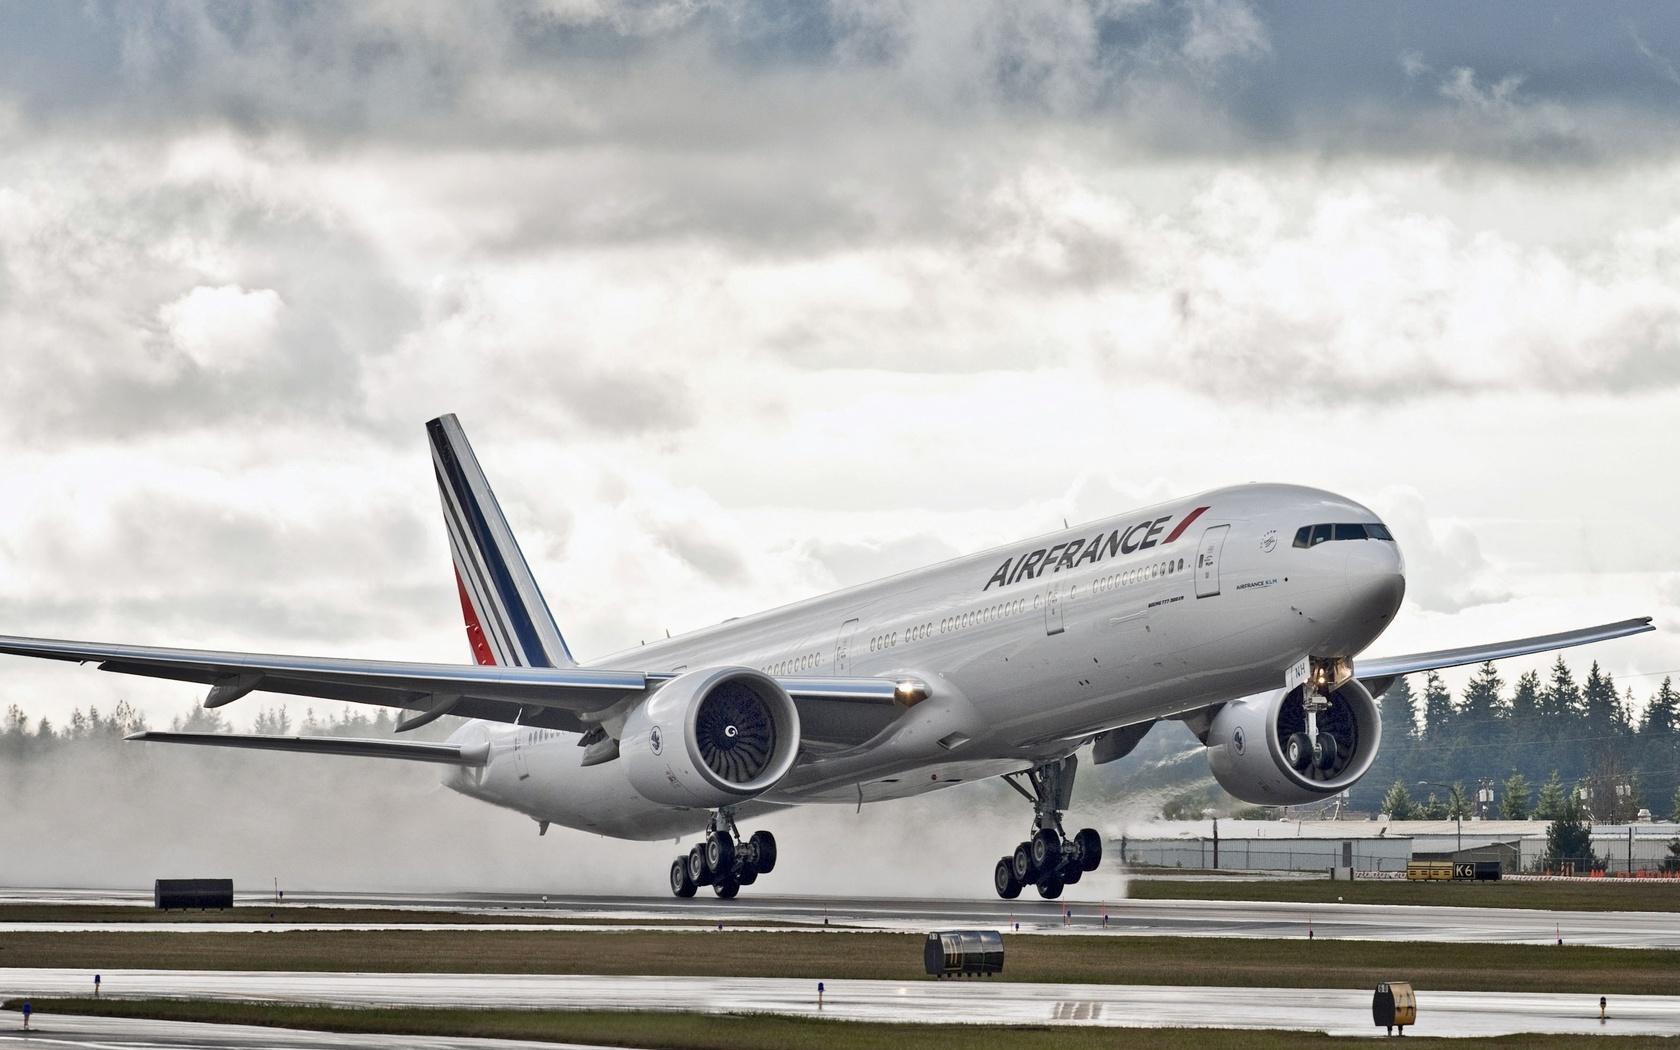 самолёт, боинг, Boeing, 777, air france, облака, boeing 777